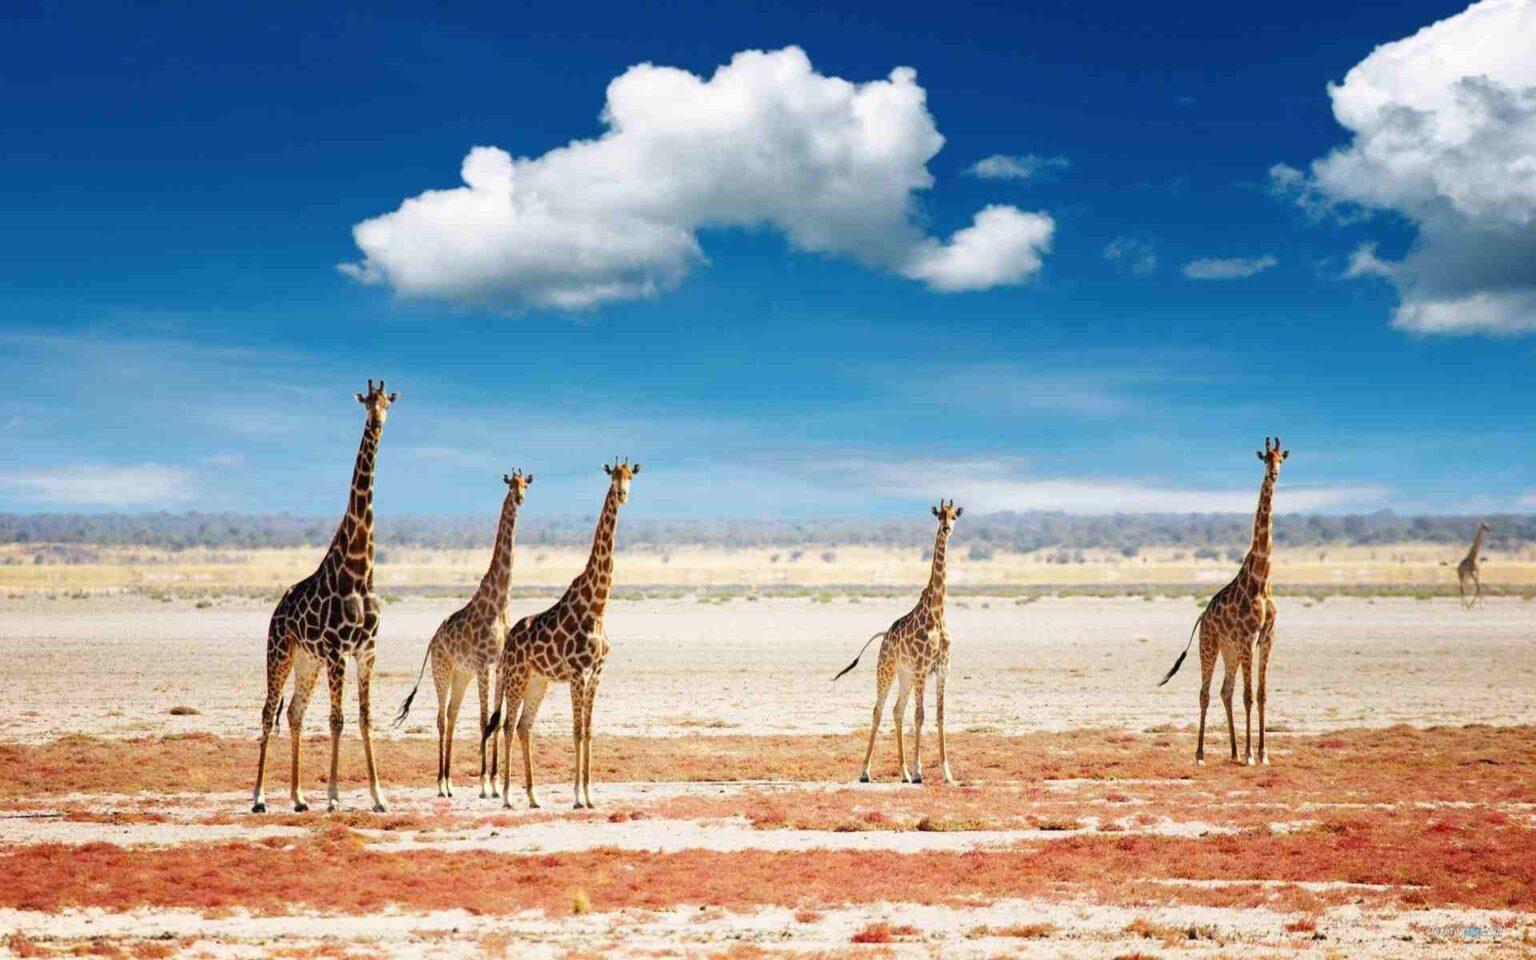 giraffes-in-the-african-grassland